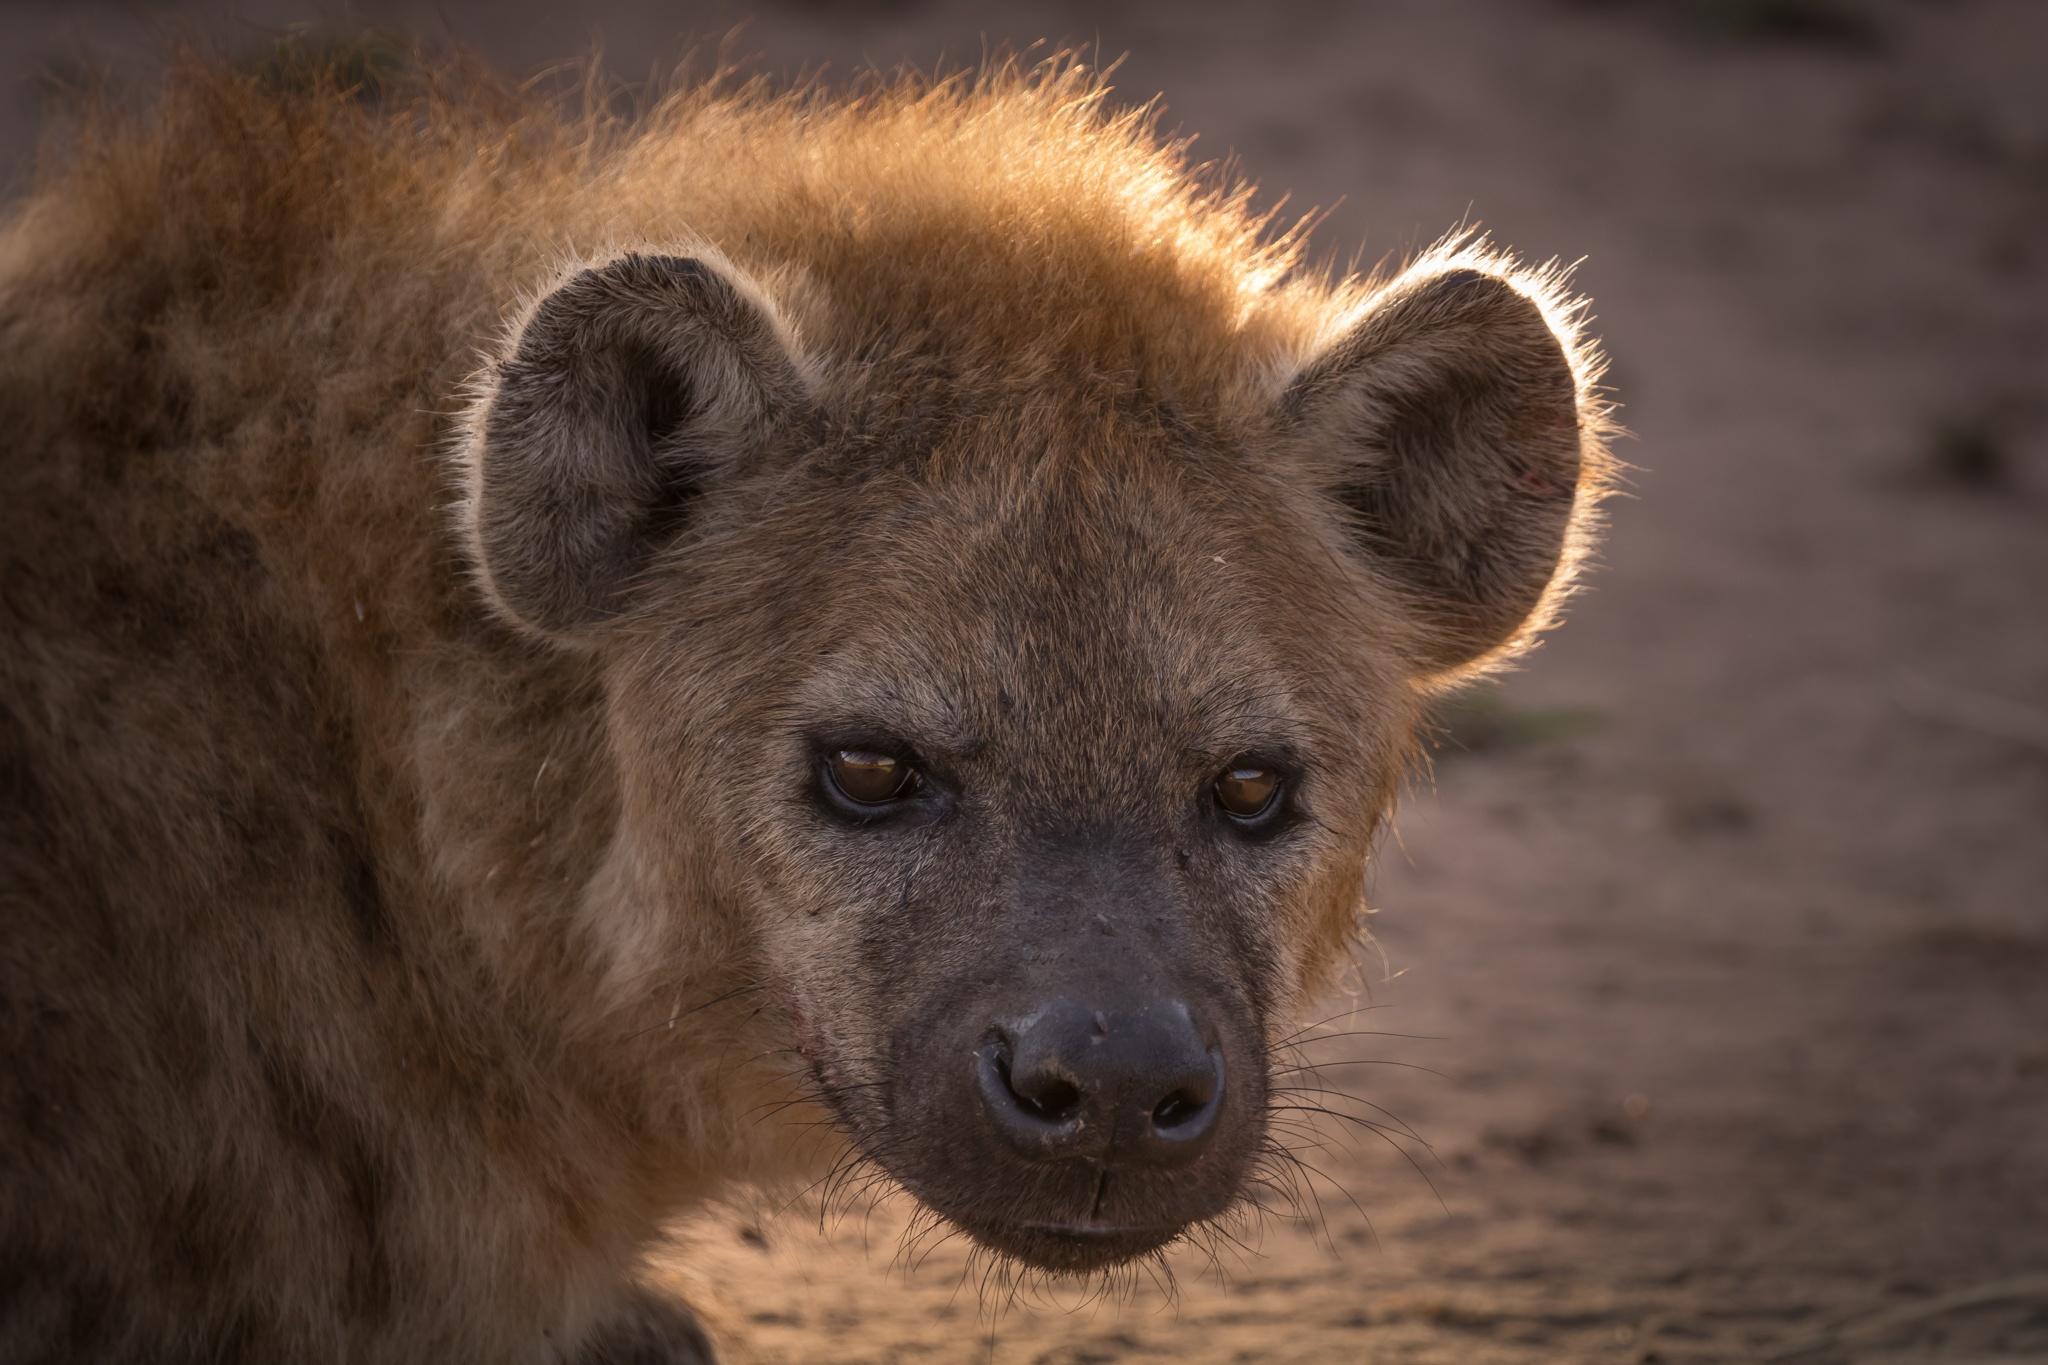 Hyena by sachin sawhney